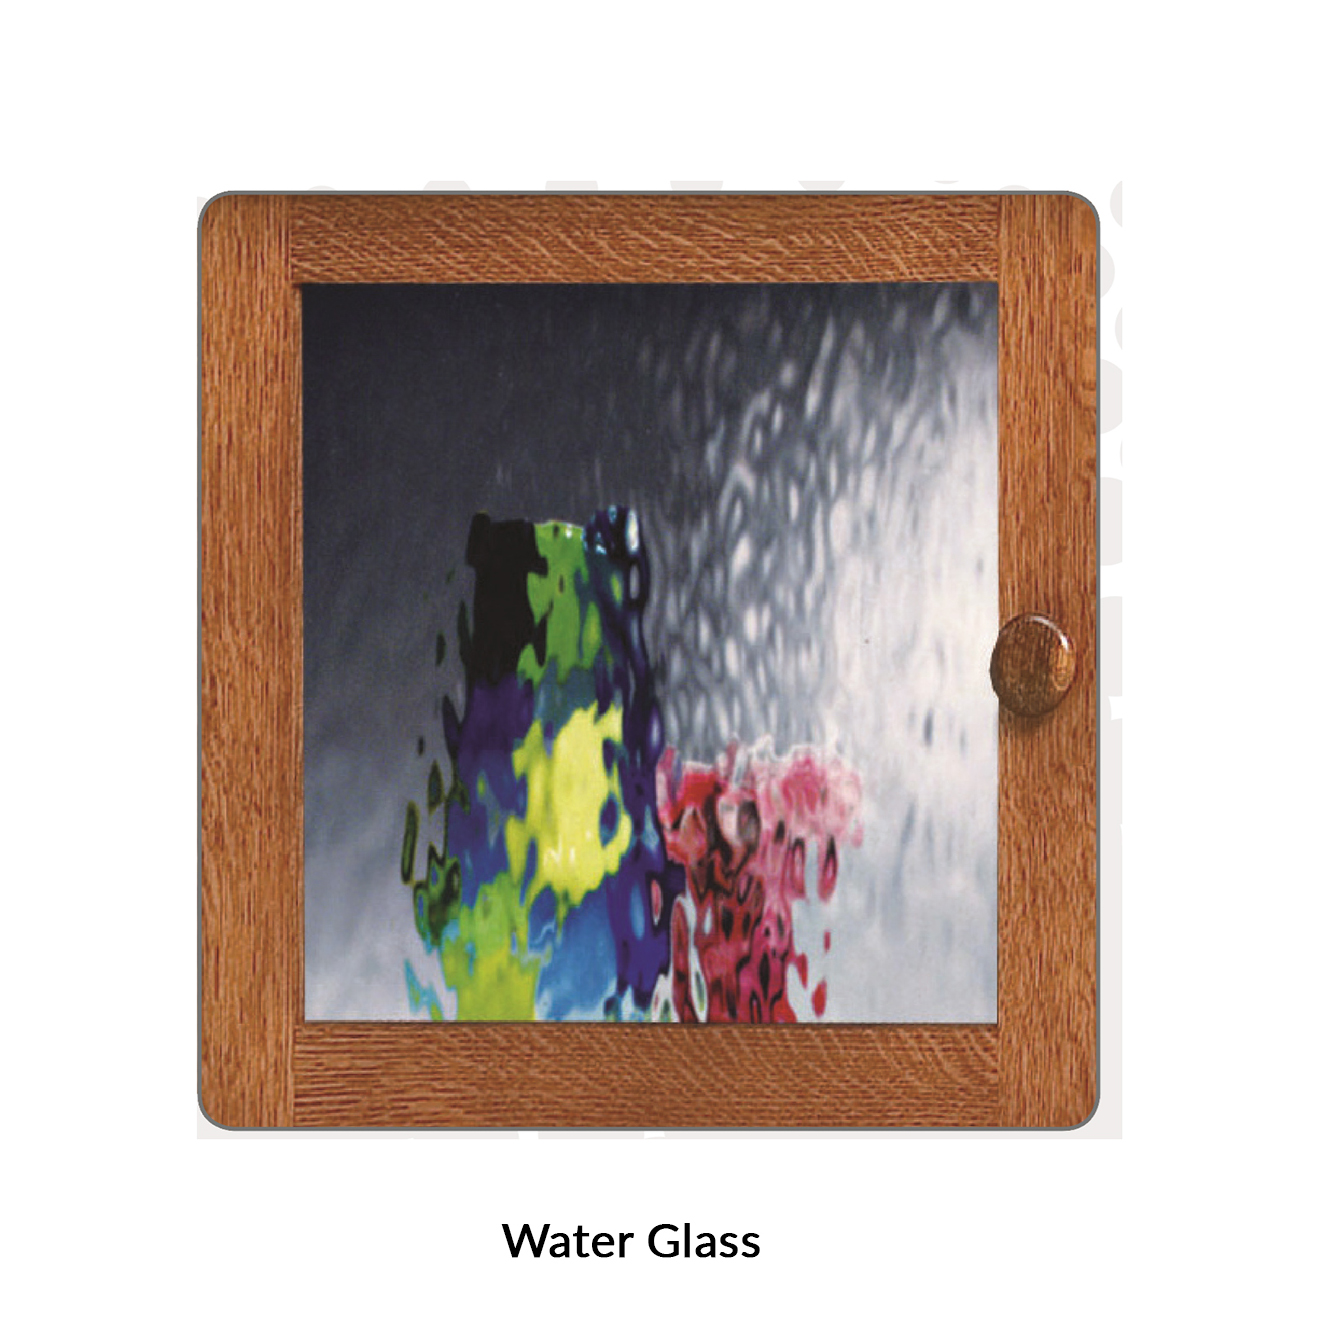 13-tf-water-glass.jpg